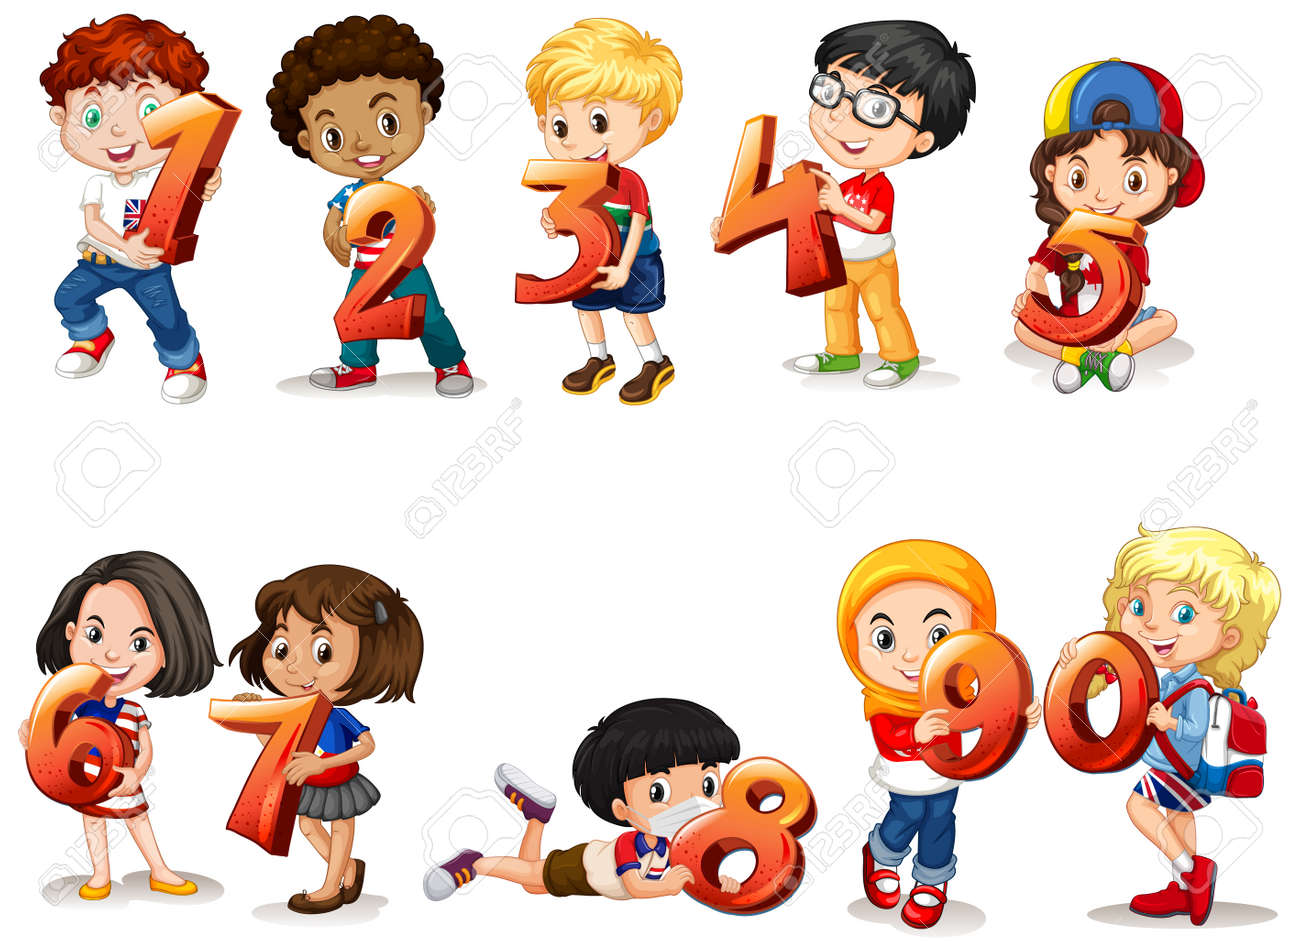 Set of different children holding math number illustration - 153809875